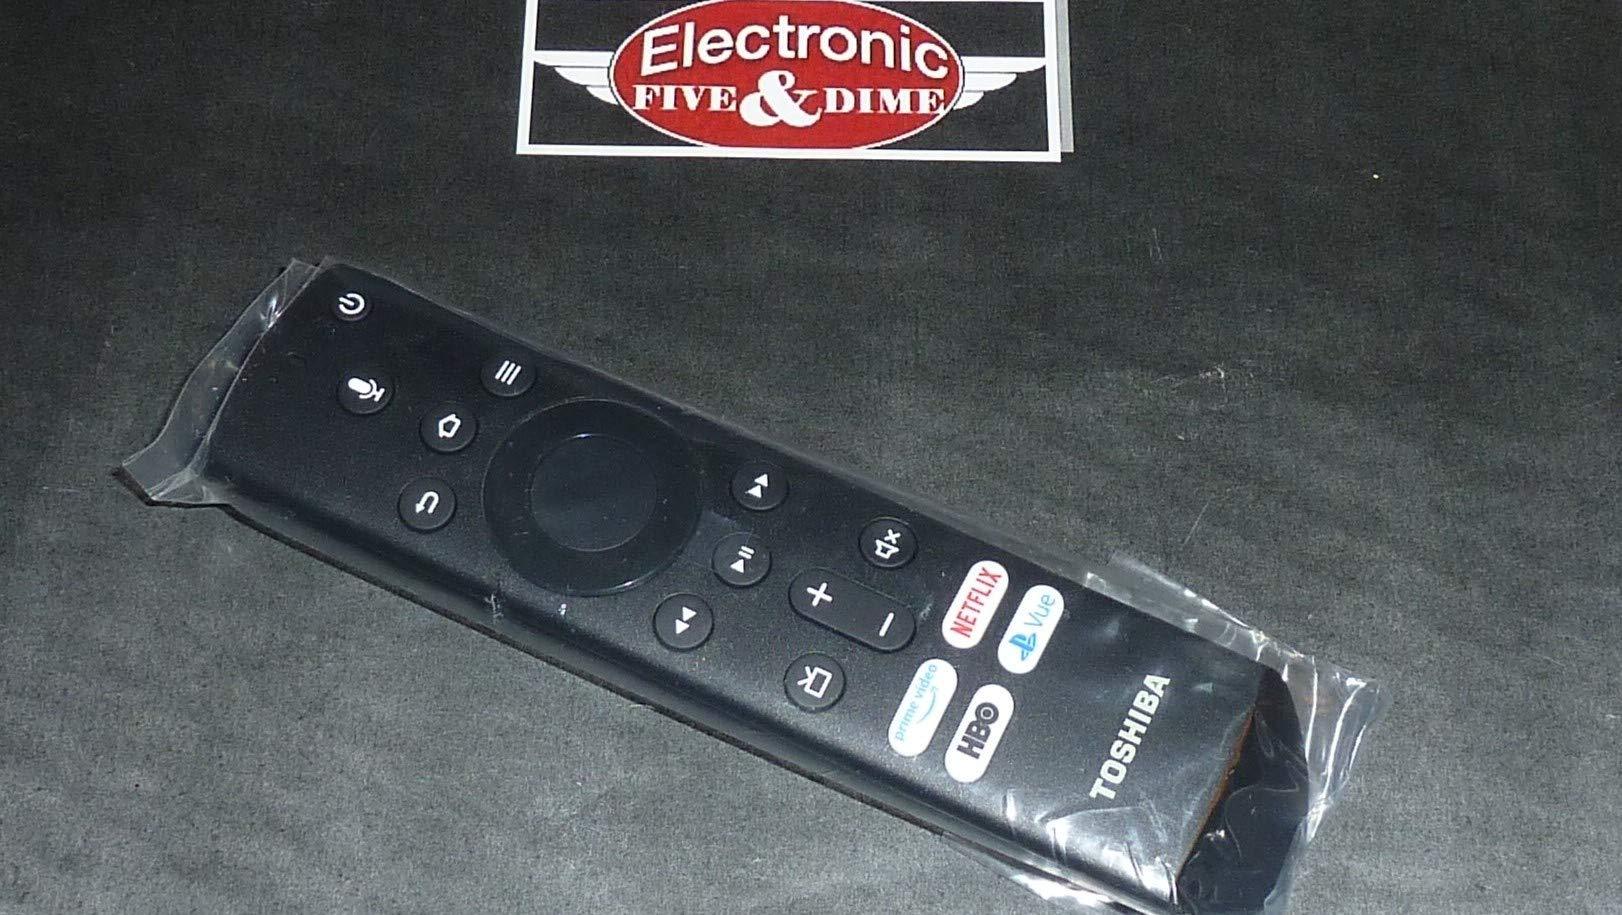 Insignia NS-RCFNA-19 RF/Smart/Voice Remote for NS-24DF310NA19 NS-32DF310NA19 NS-39DF510NA19 NS-43DF710NA19 NS-50DF710NA19 NS-55DF710NA19 50LF621U19 55LF621U19 50LED2160P 55LED2160P by ENWShop